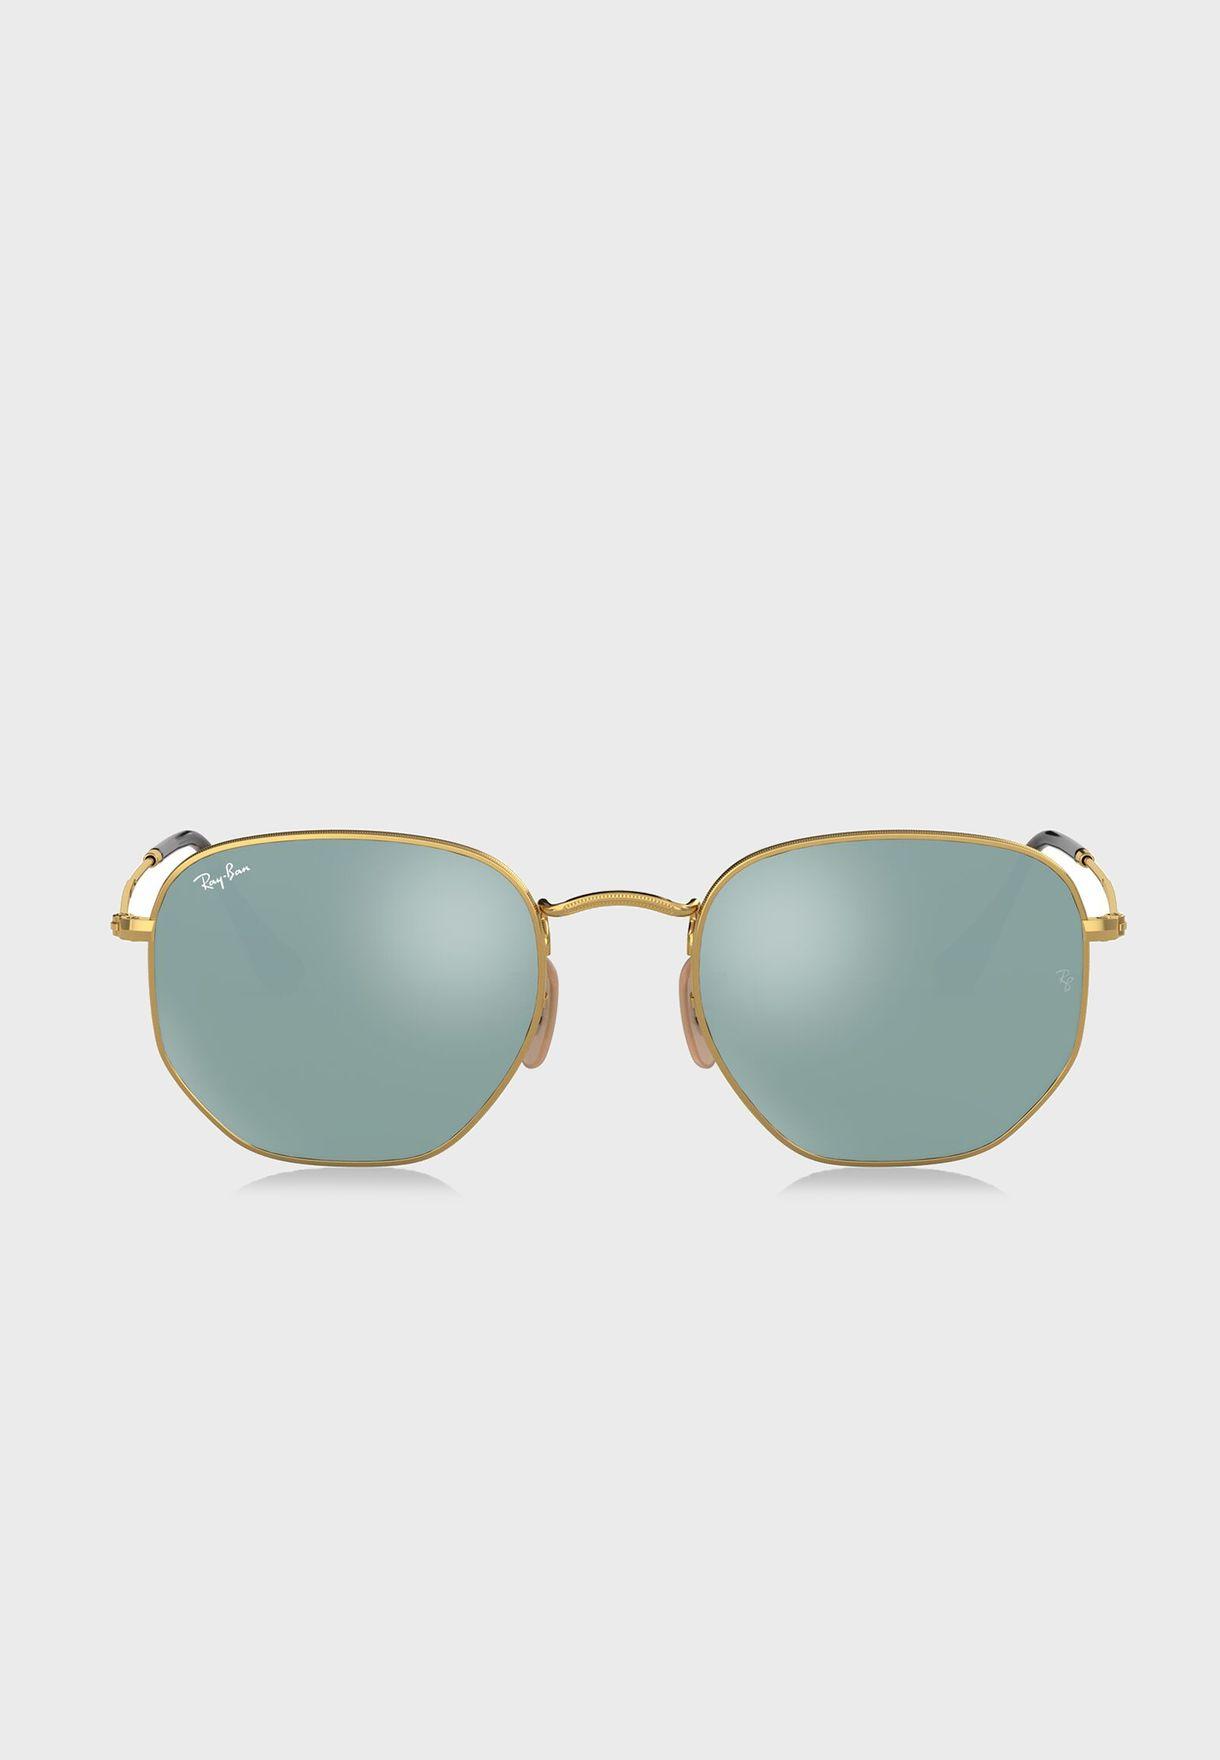 0c41846d6 تسوق نظارة شمسية سداسية ماركة ريبان لون ذهبي 8053672611687 في ...